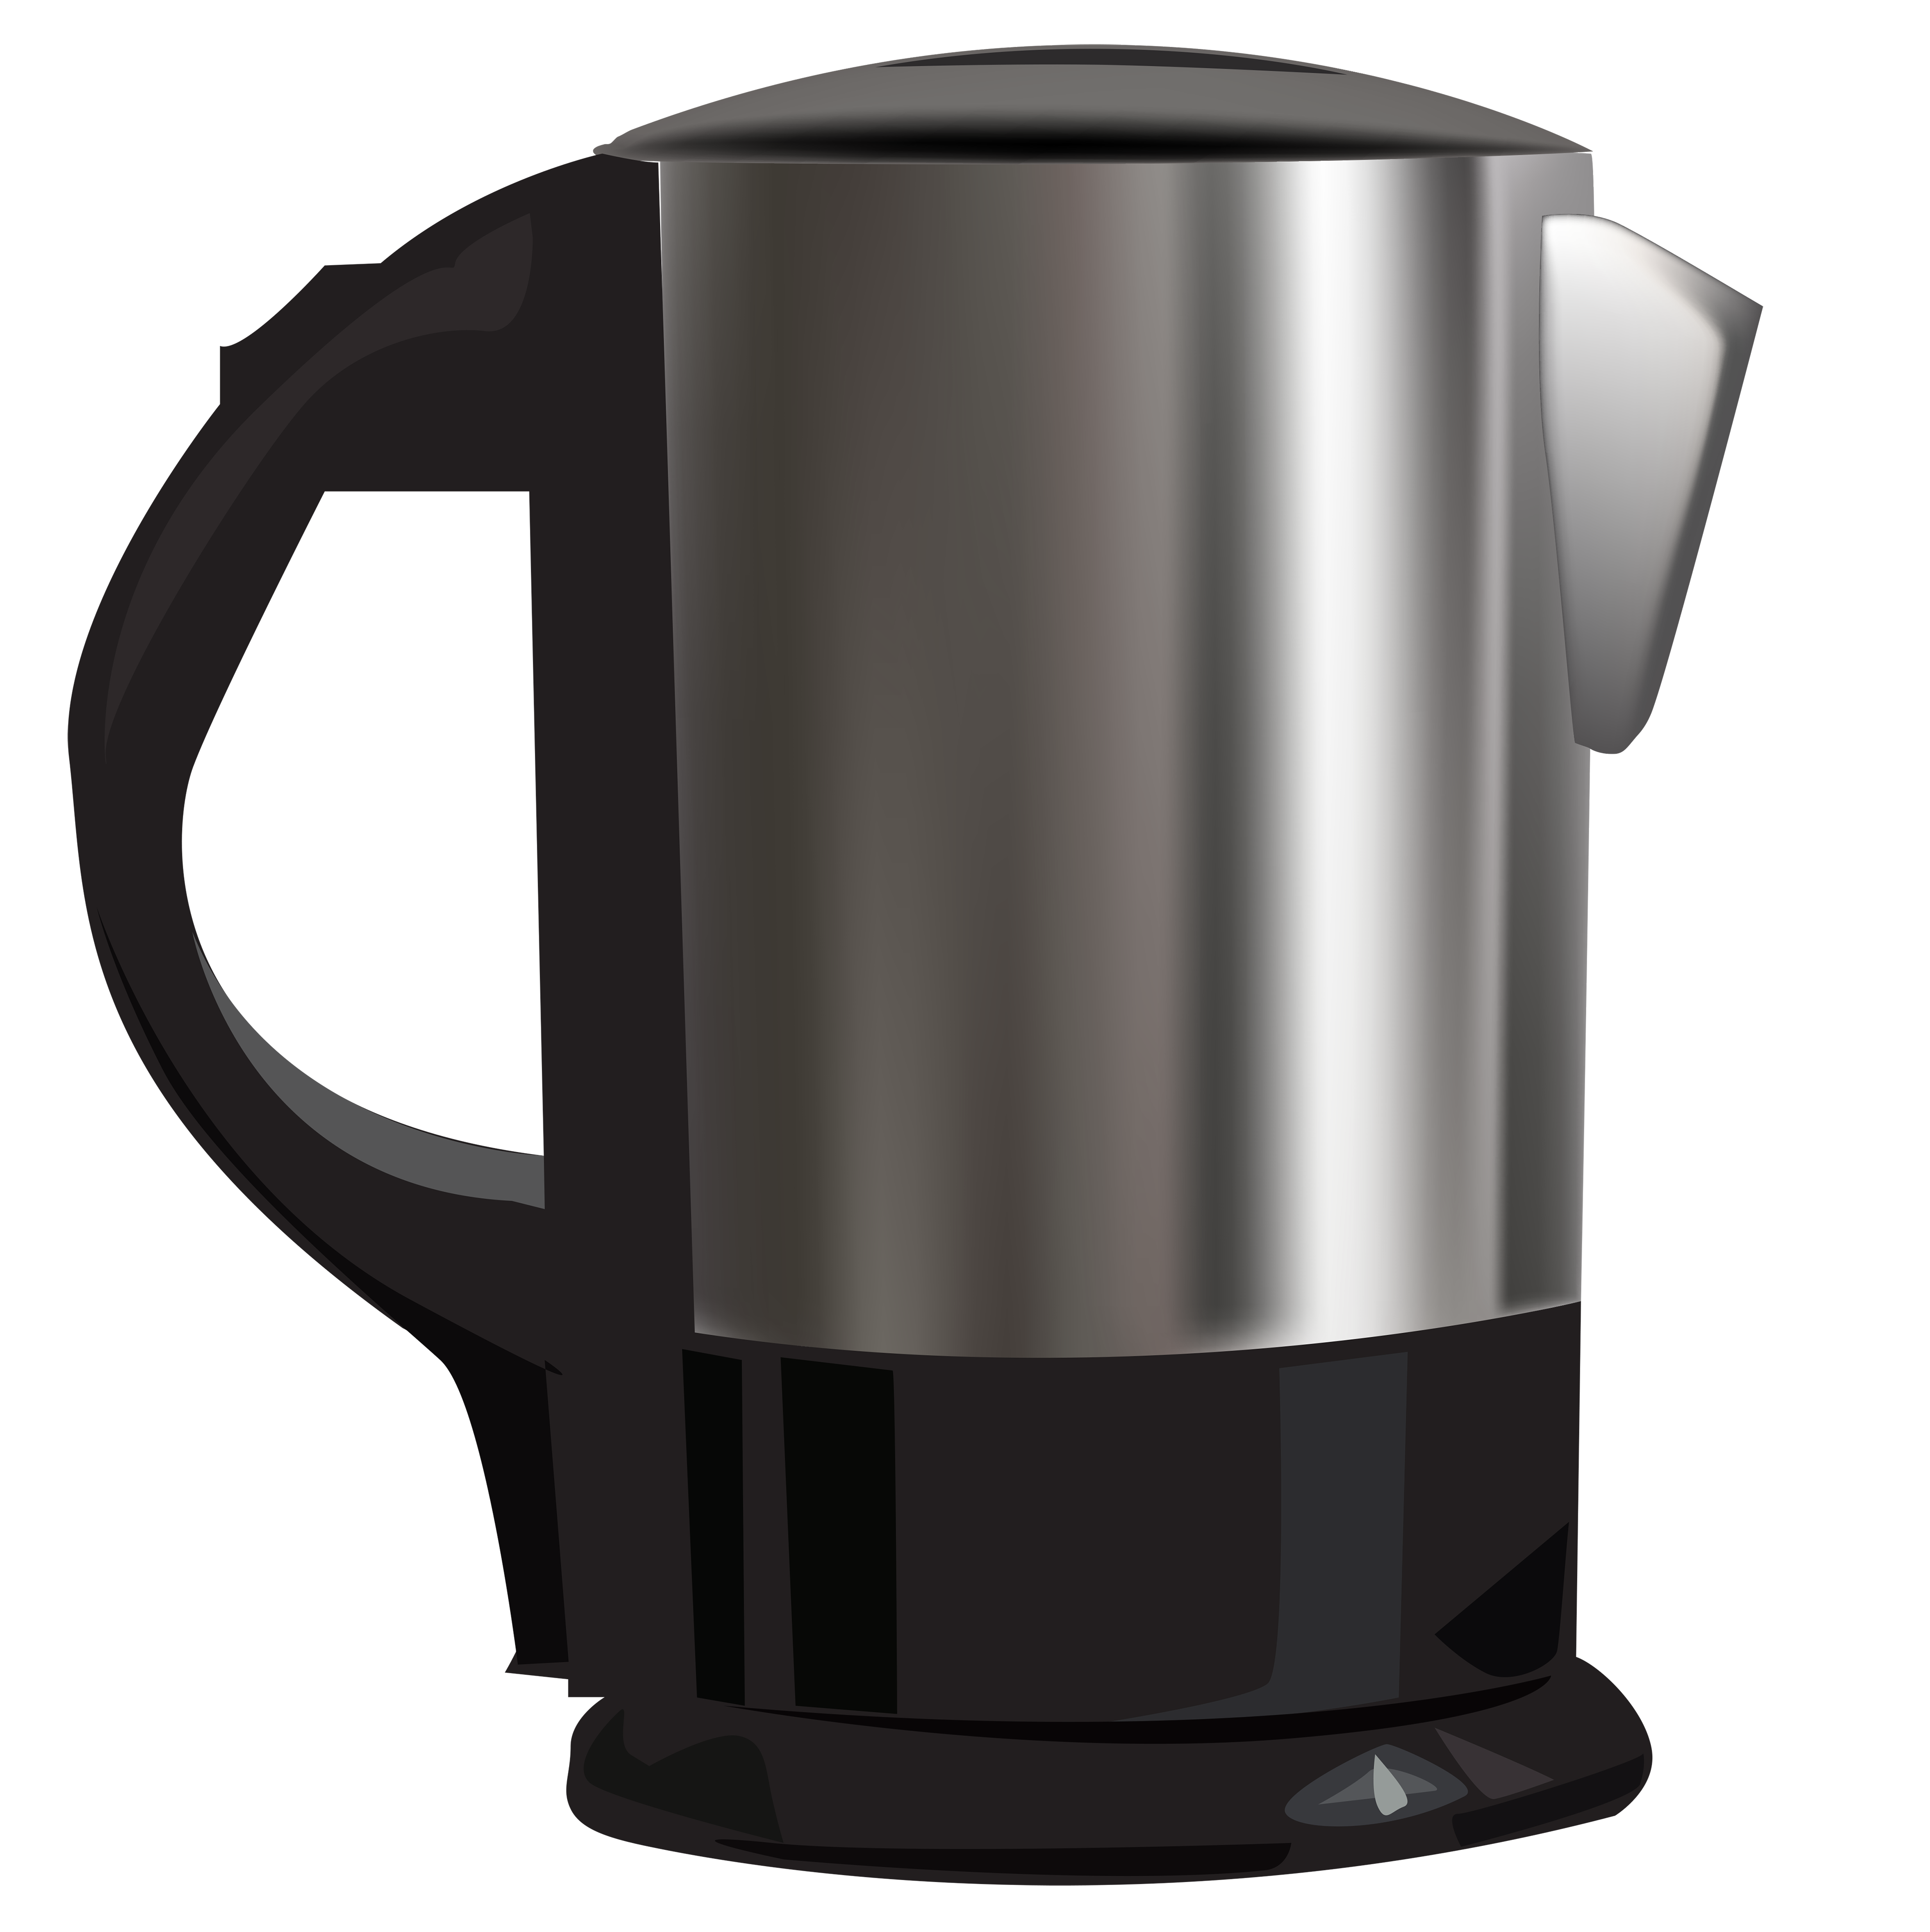 Pot png transparent images. Clipart coffee kettle